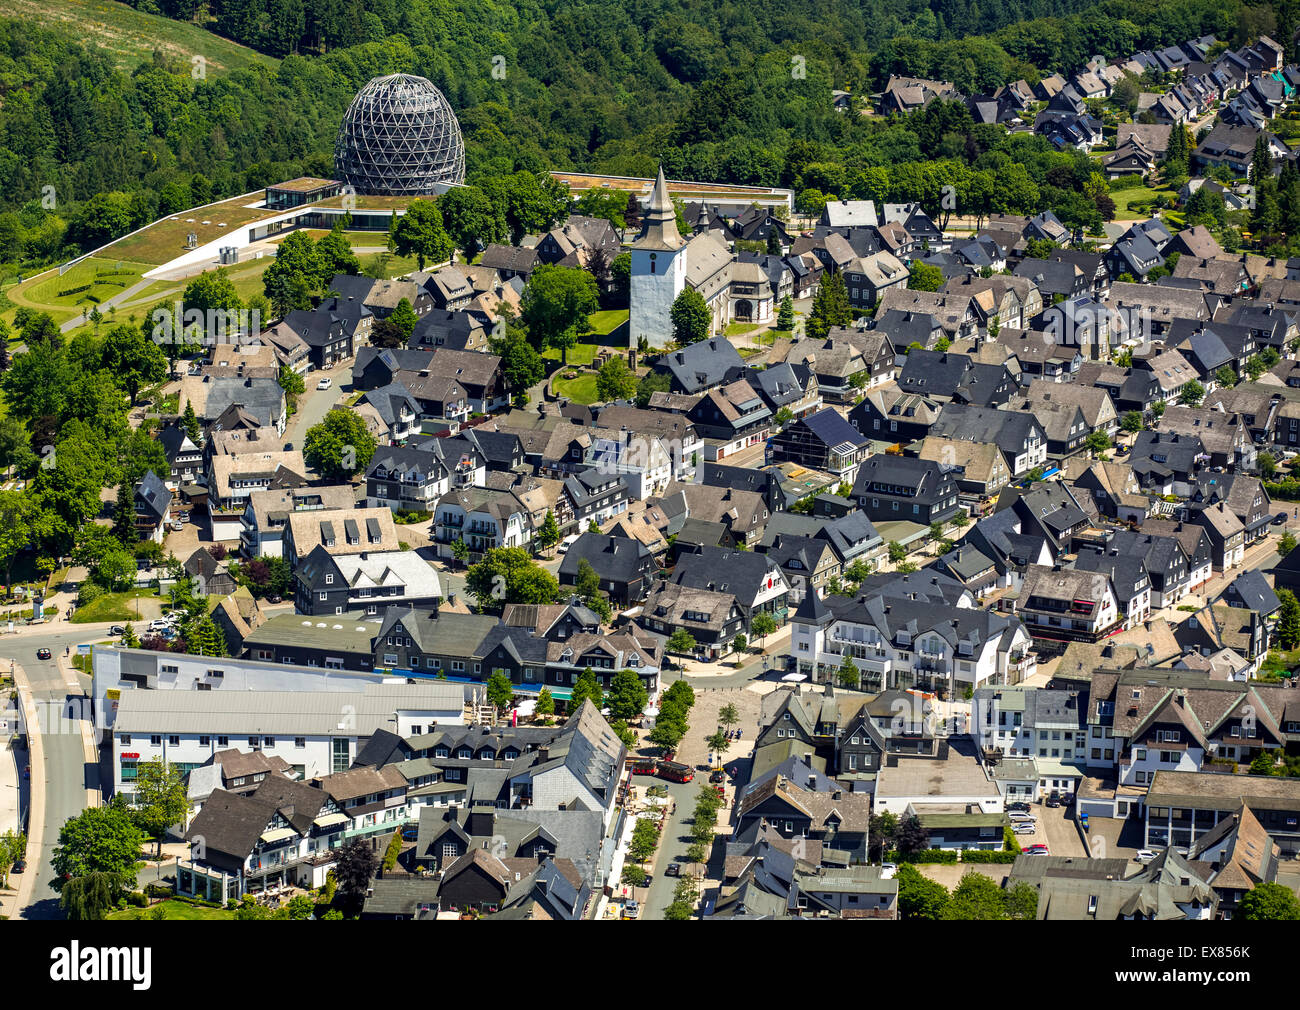 Townscape with the Oversum Vital Resort, Winterberg, Sauerland, North Rhine-Westphalia, Germany - Stock Image